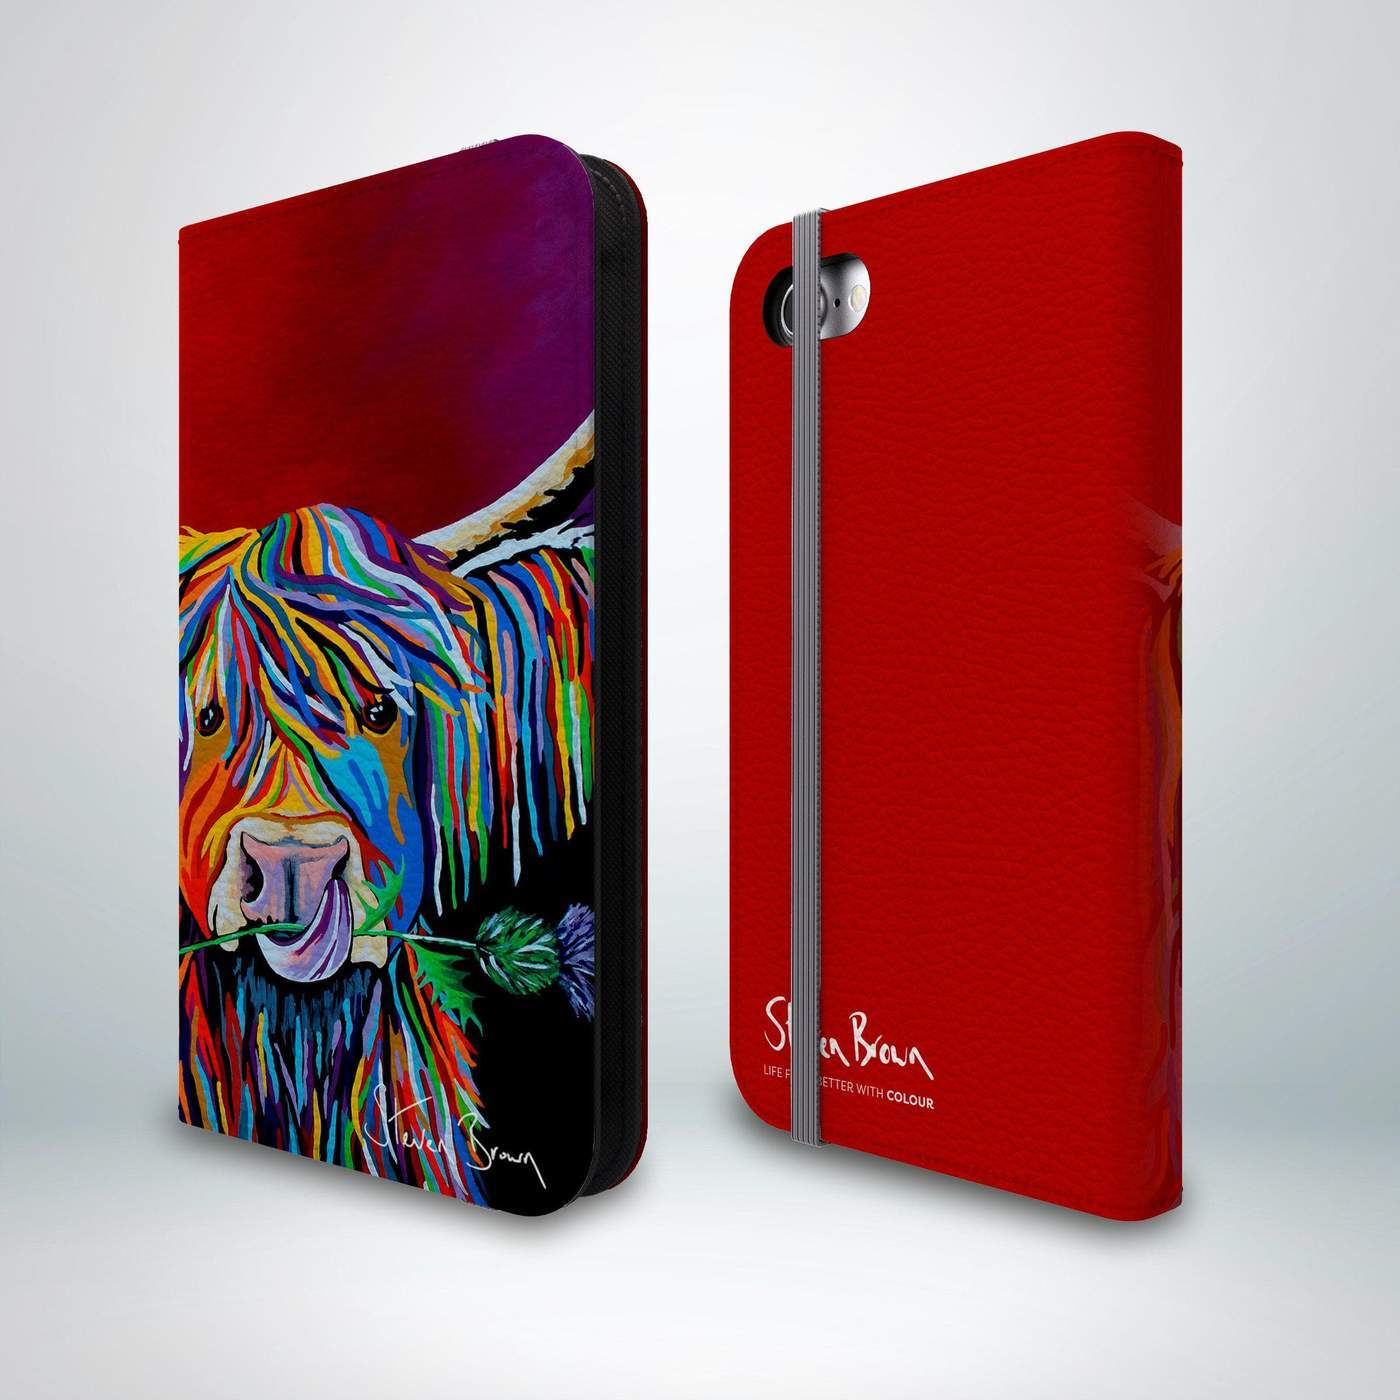 Steven Brown Flip Phone Case - Technology  Collection